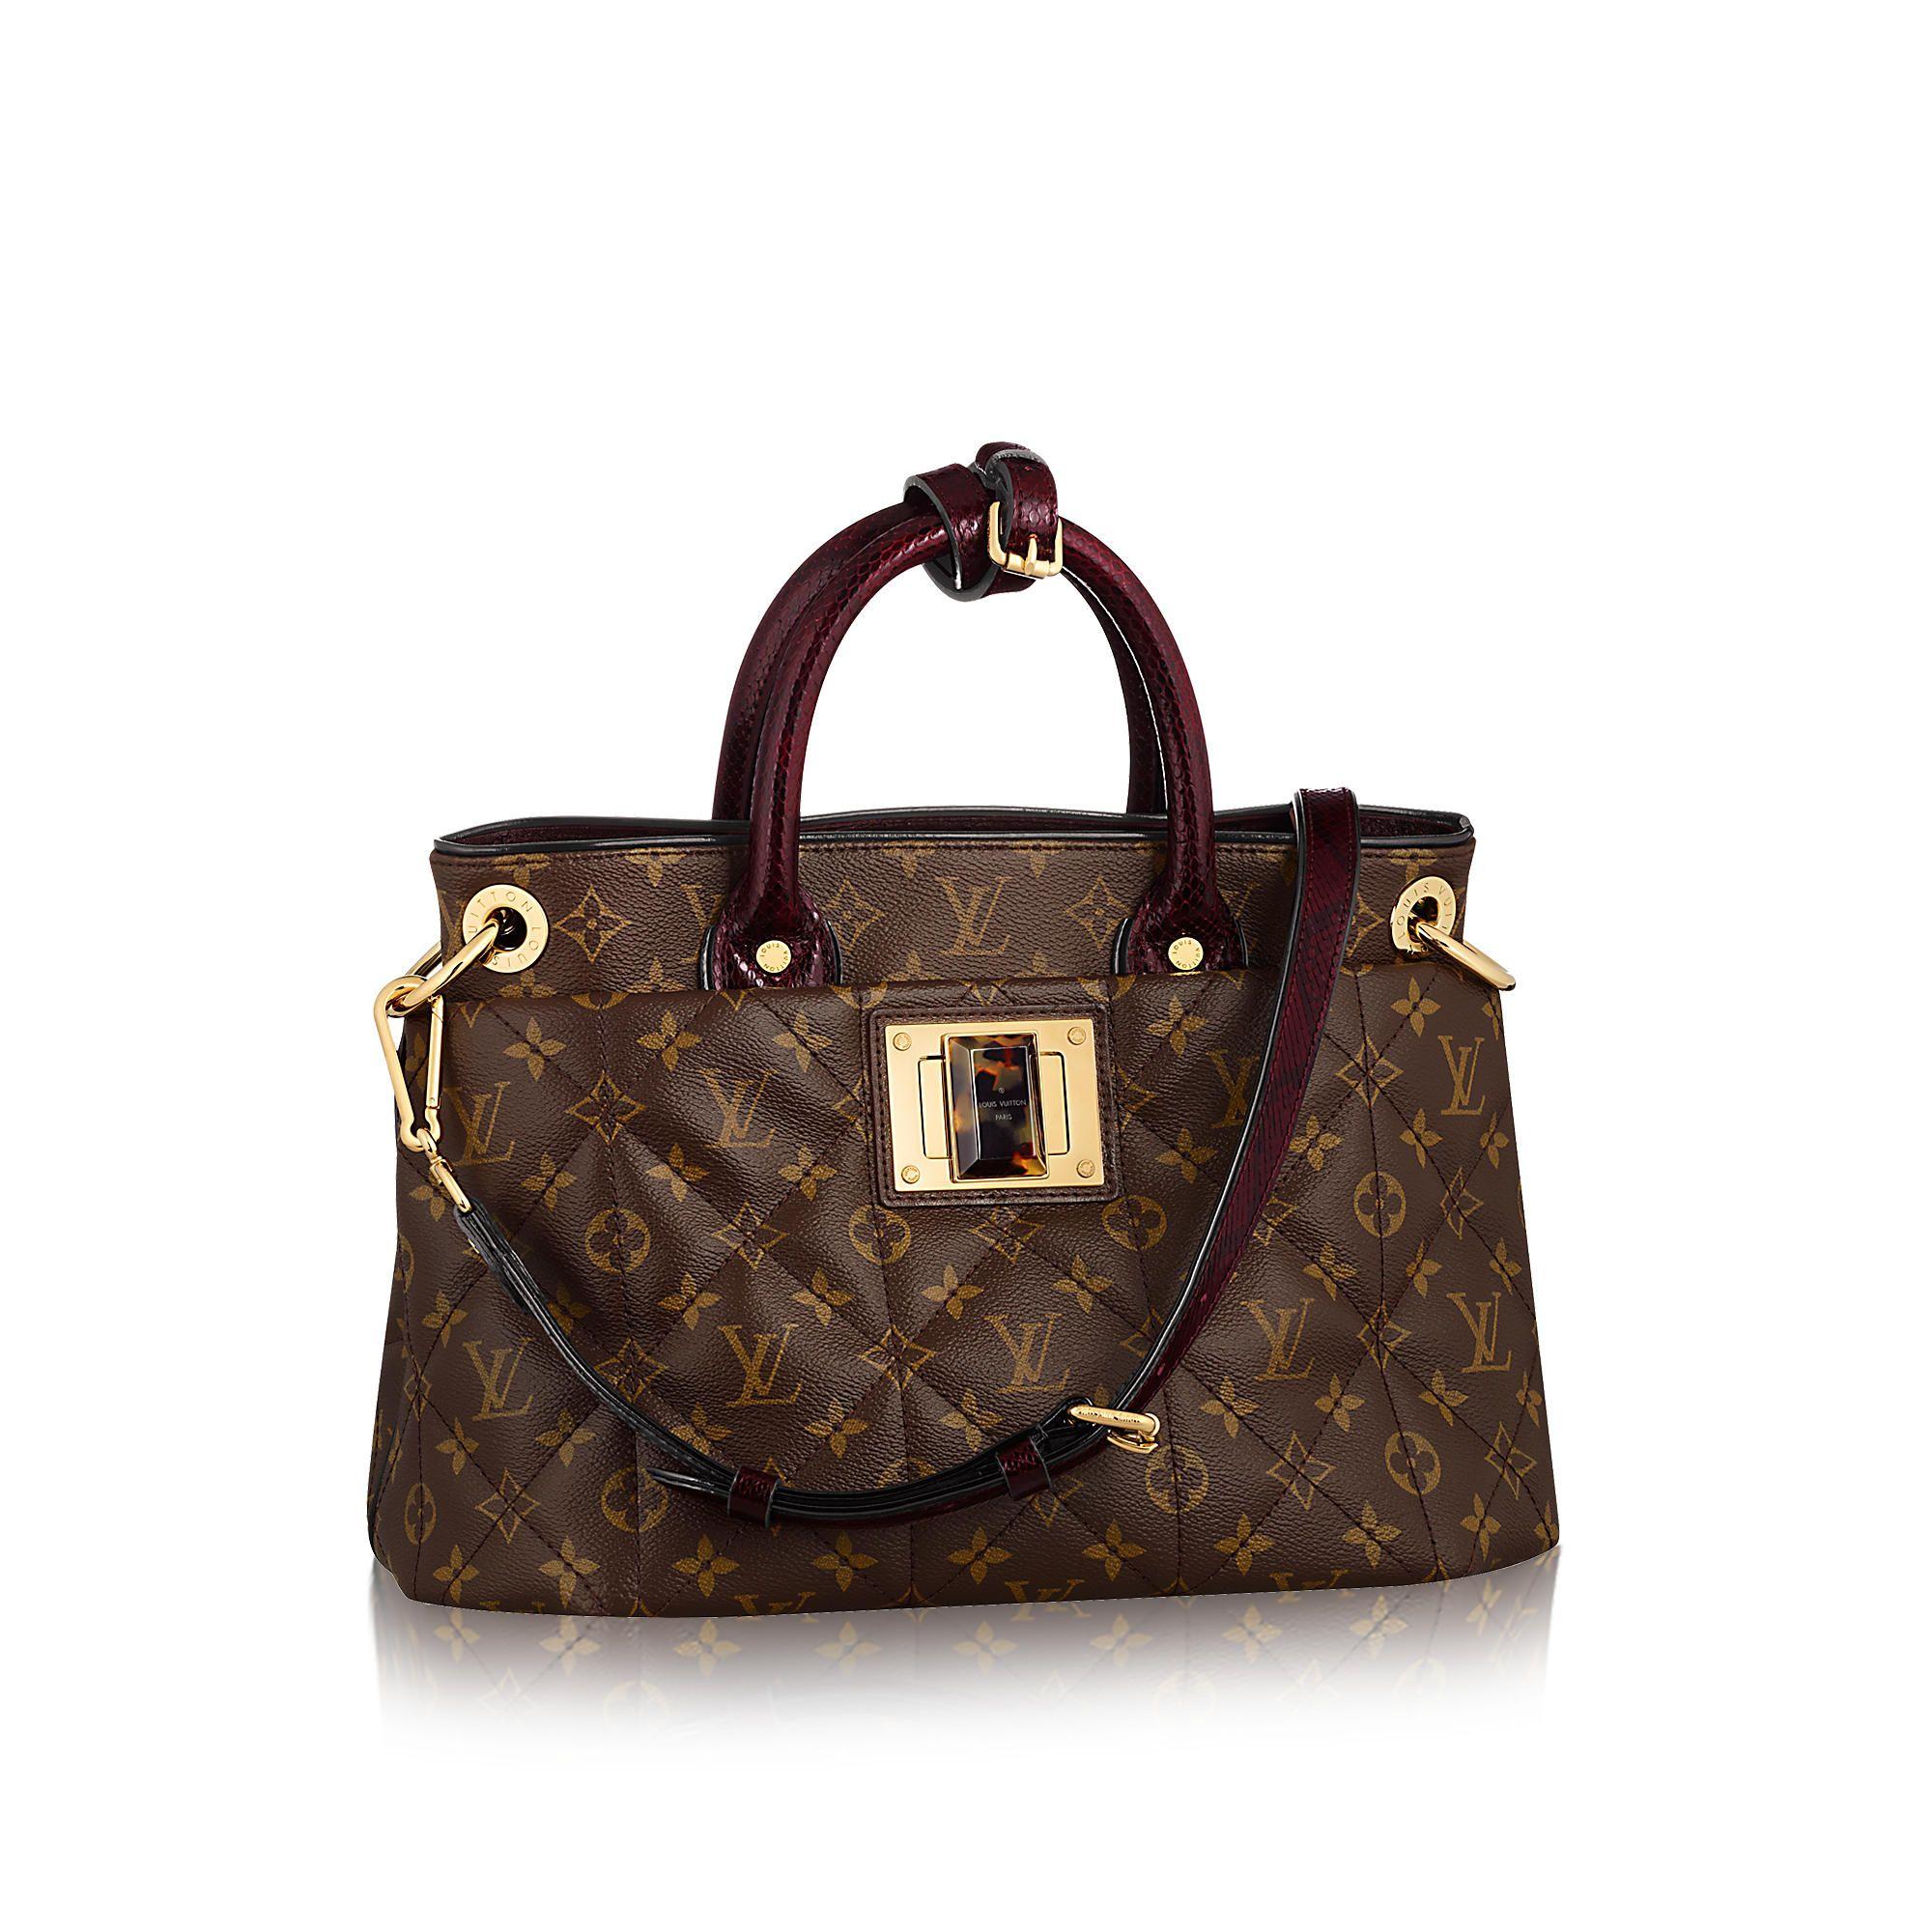 Tote MM - Monogram Exotique - Special Handbags | LOUIS VUITTON